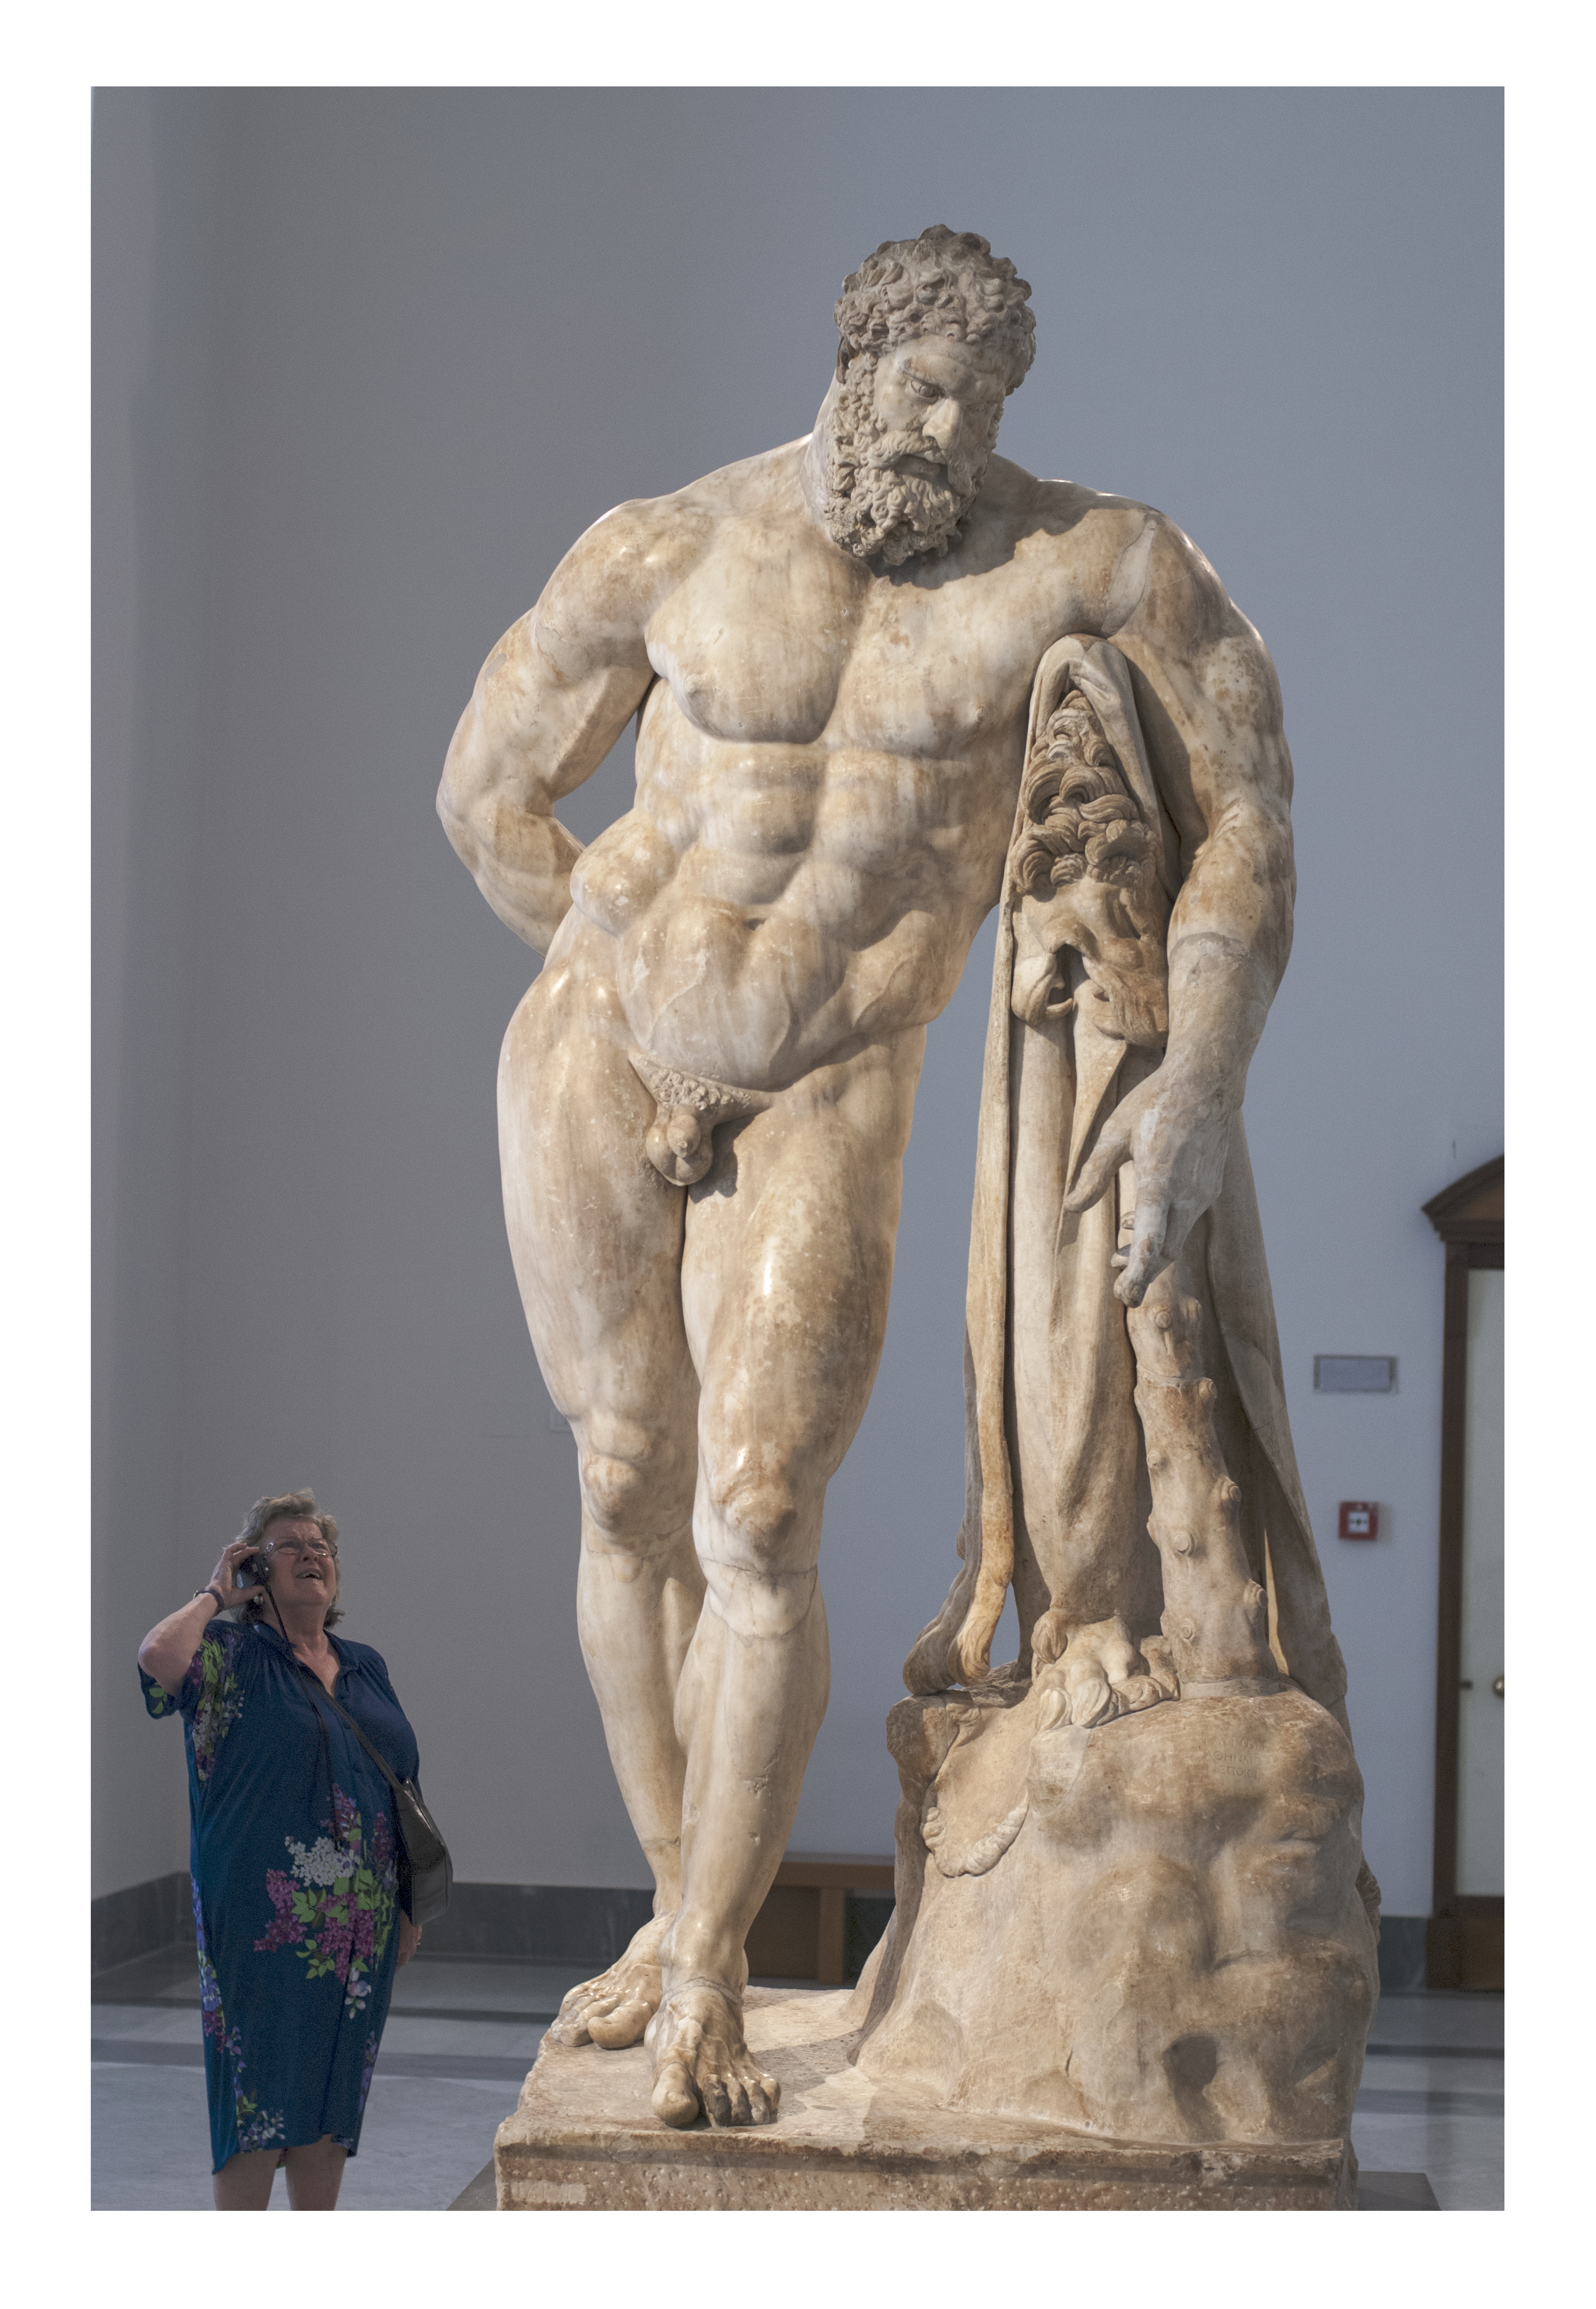 Farnese Hercules, Naples